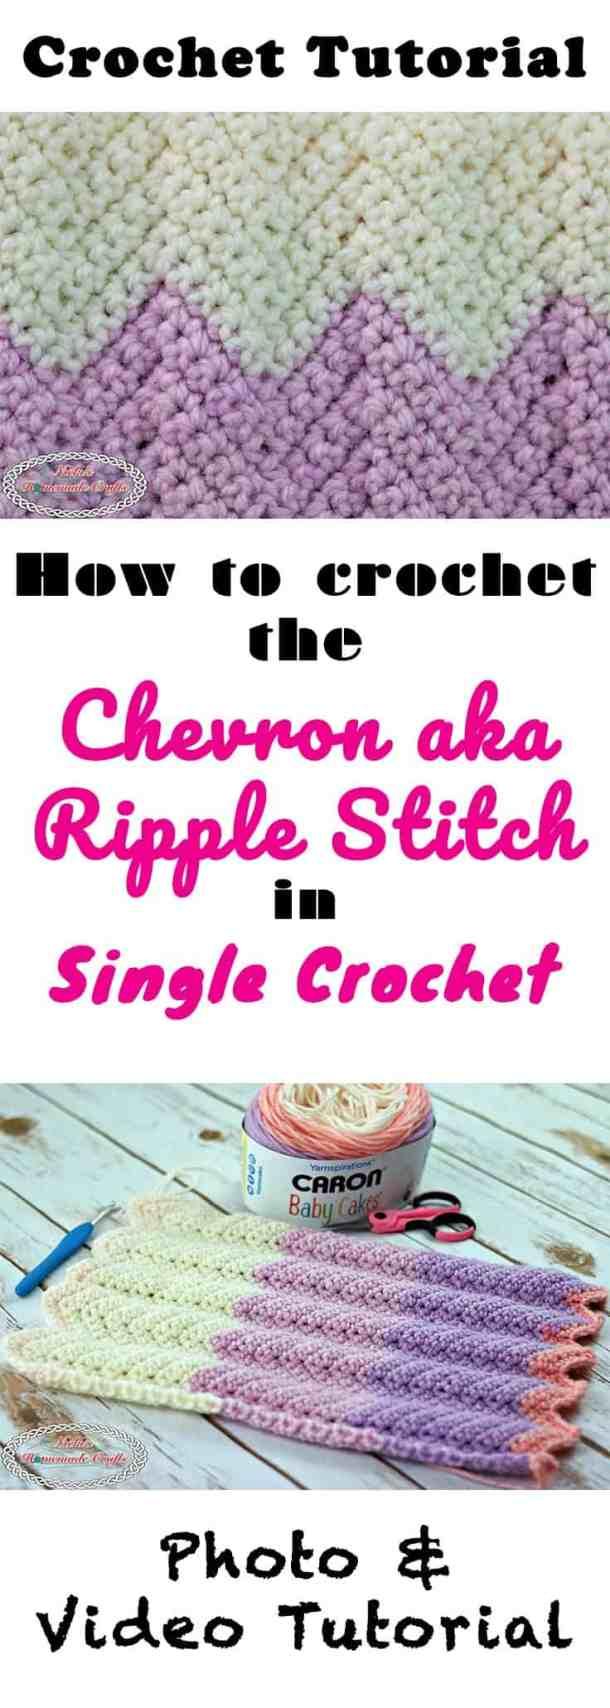 #crochet #chevron #crochetstitch #crochetutorial #ripplestitch #chevronstitch #videotutorial